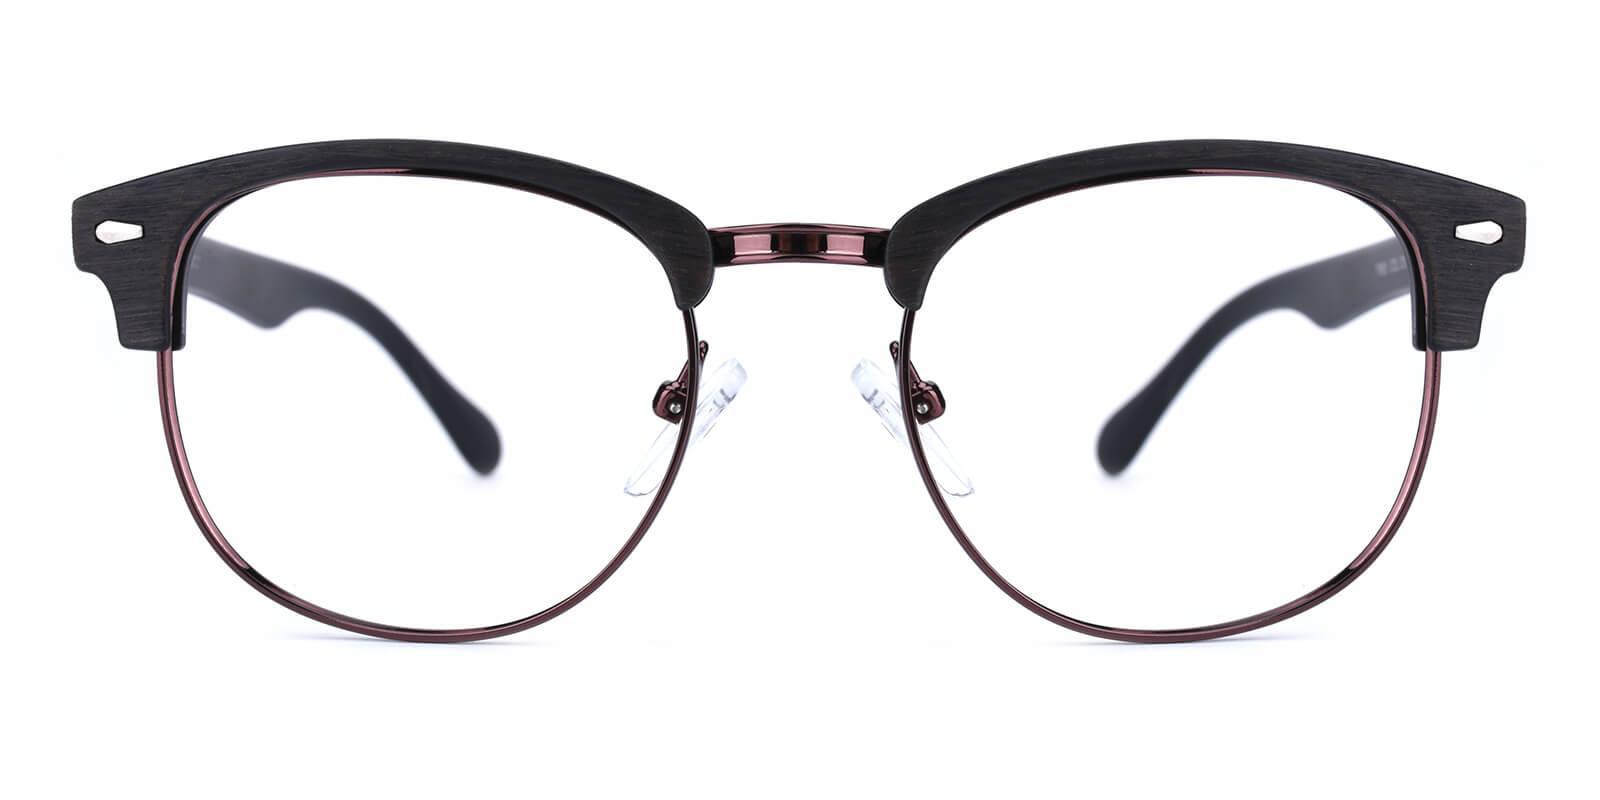 Ferrous-Gun-Browline-Metal / Combination / Plastic-Eyeglasses-additional2